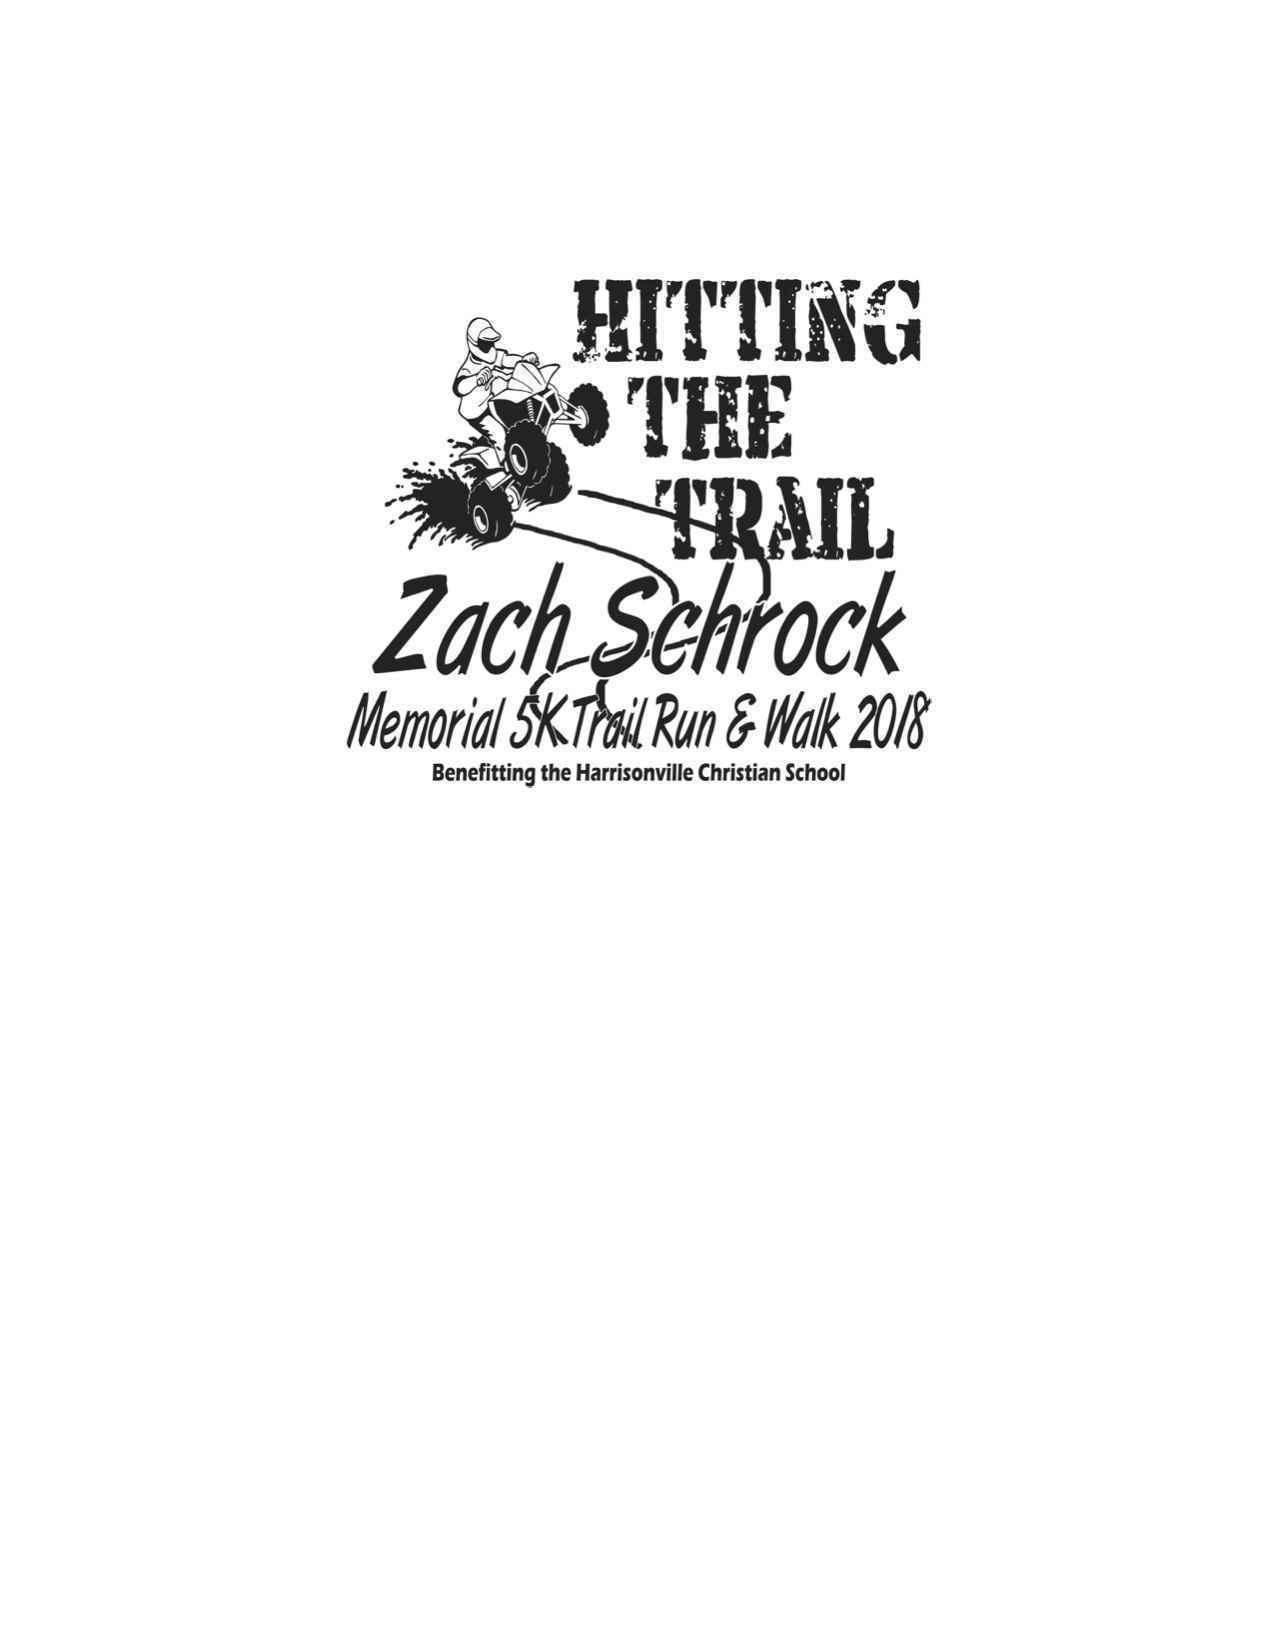 Zach Schrock Memorial 5K Trail Run/Walk image